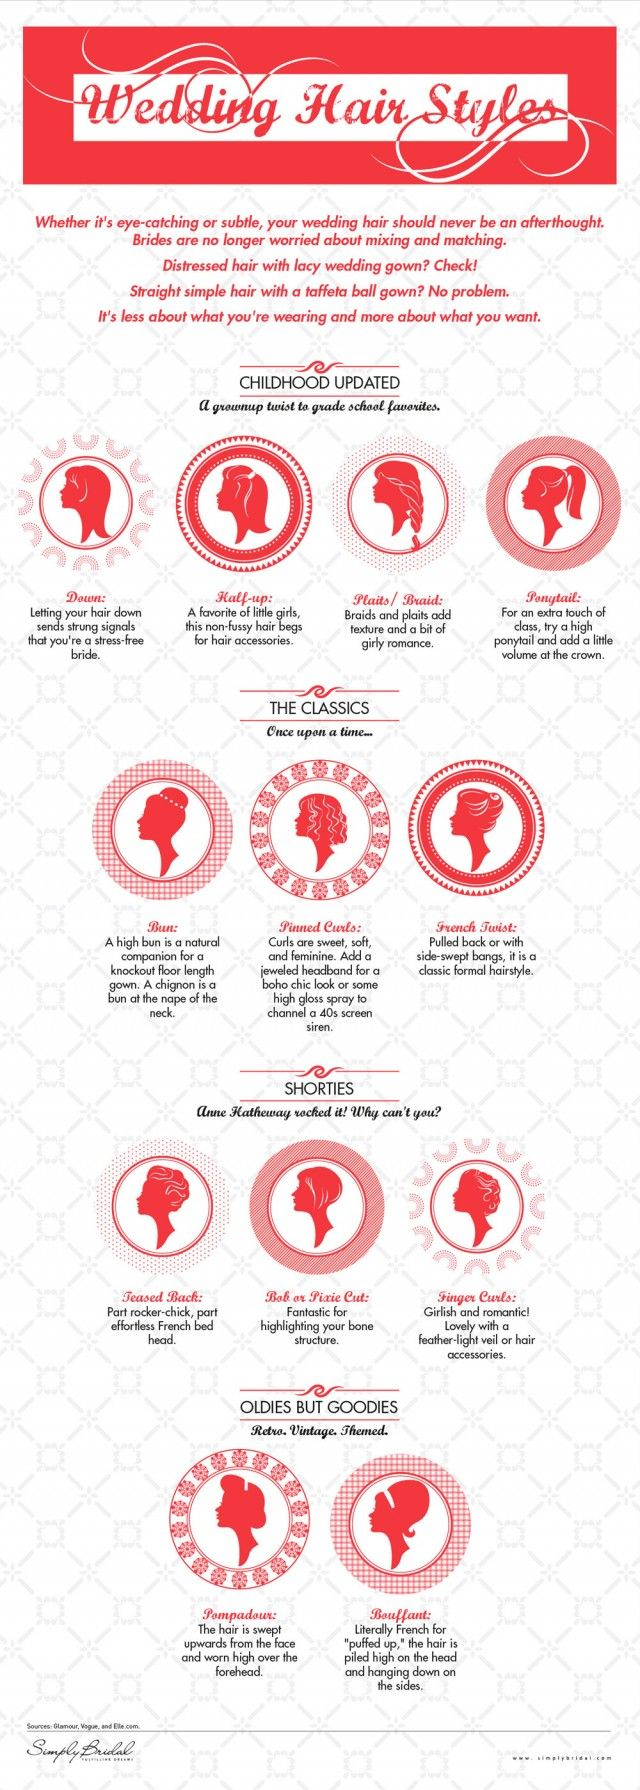 Wedding Hair Styles — Infographic